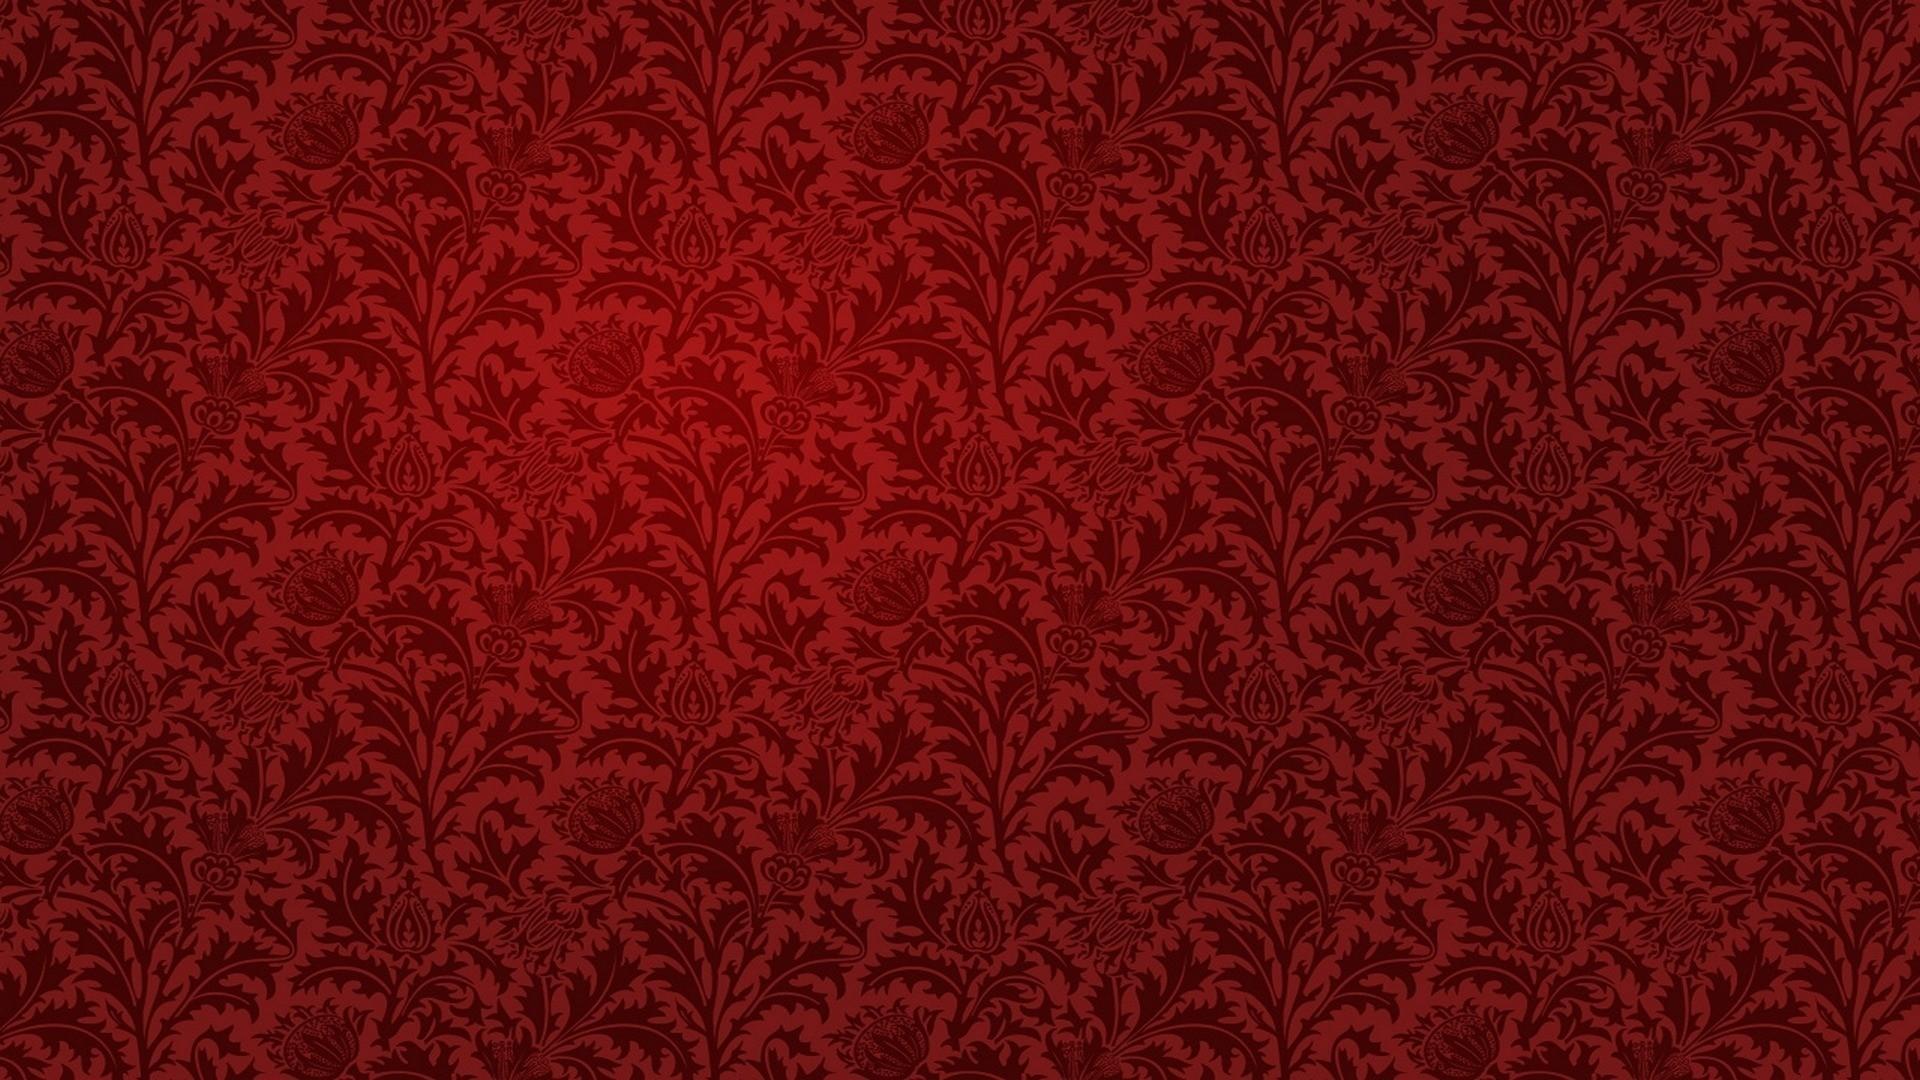 Red Patterns Wallpaper 1920x1080 Red Patterns 1920x1080